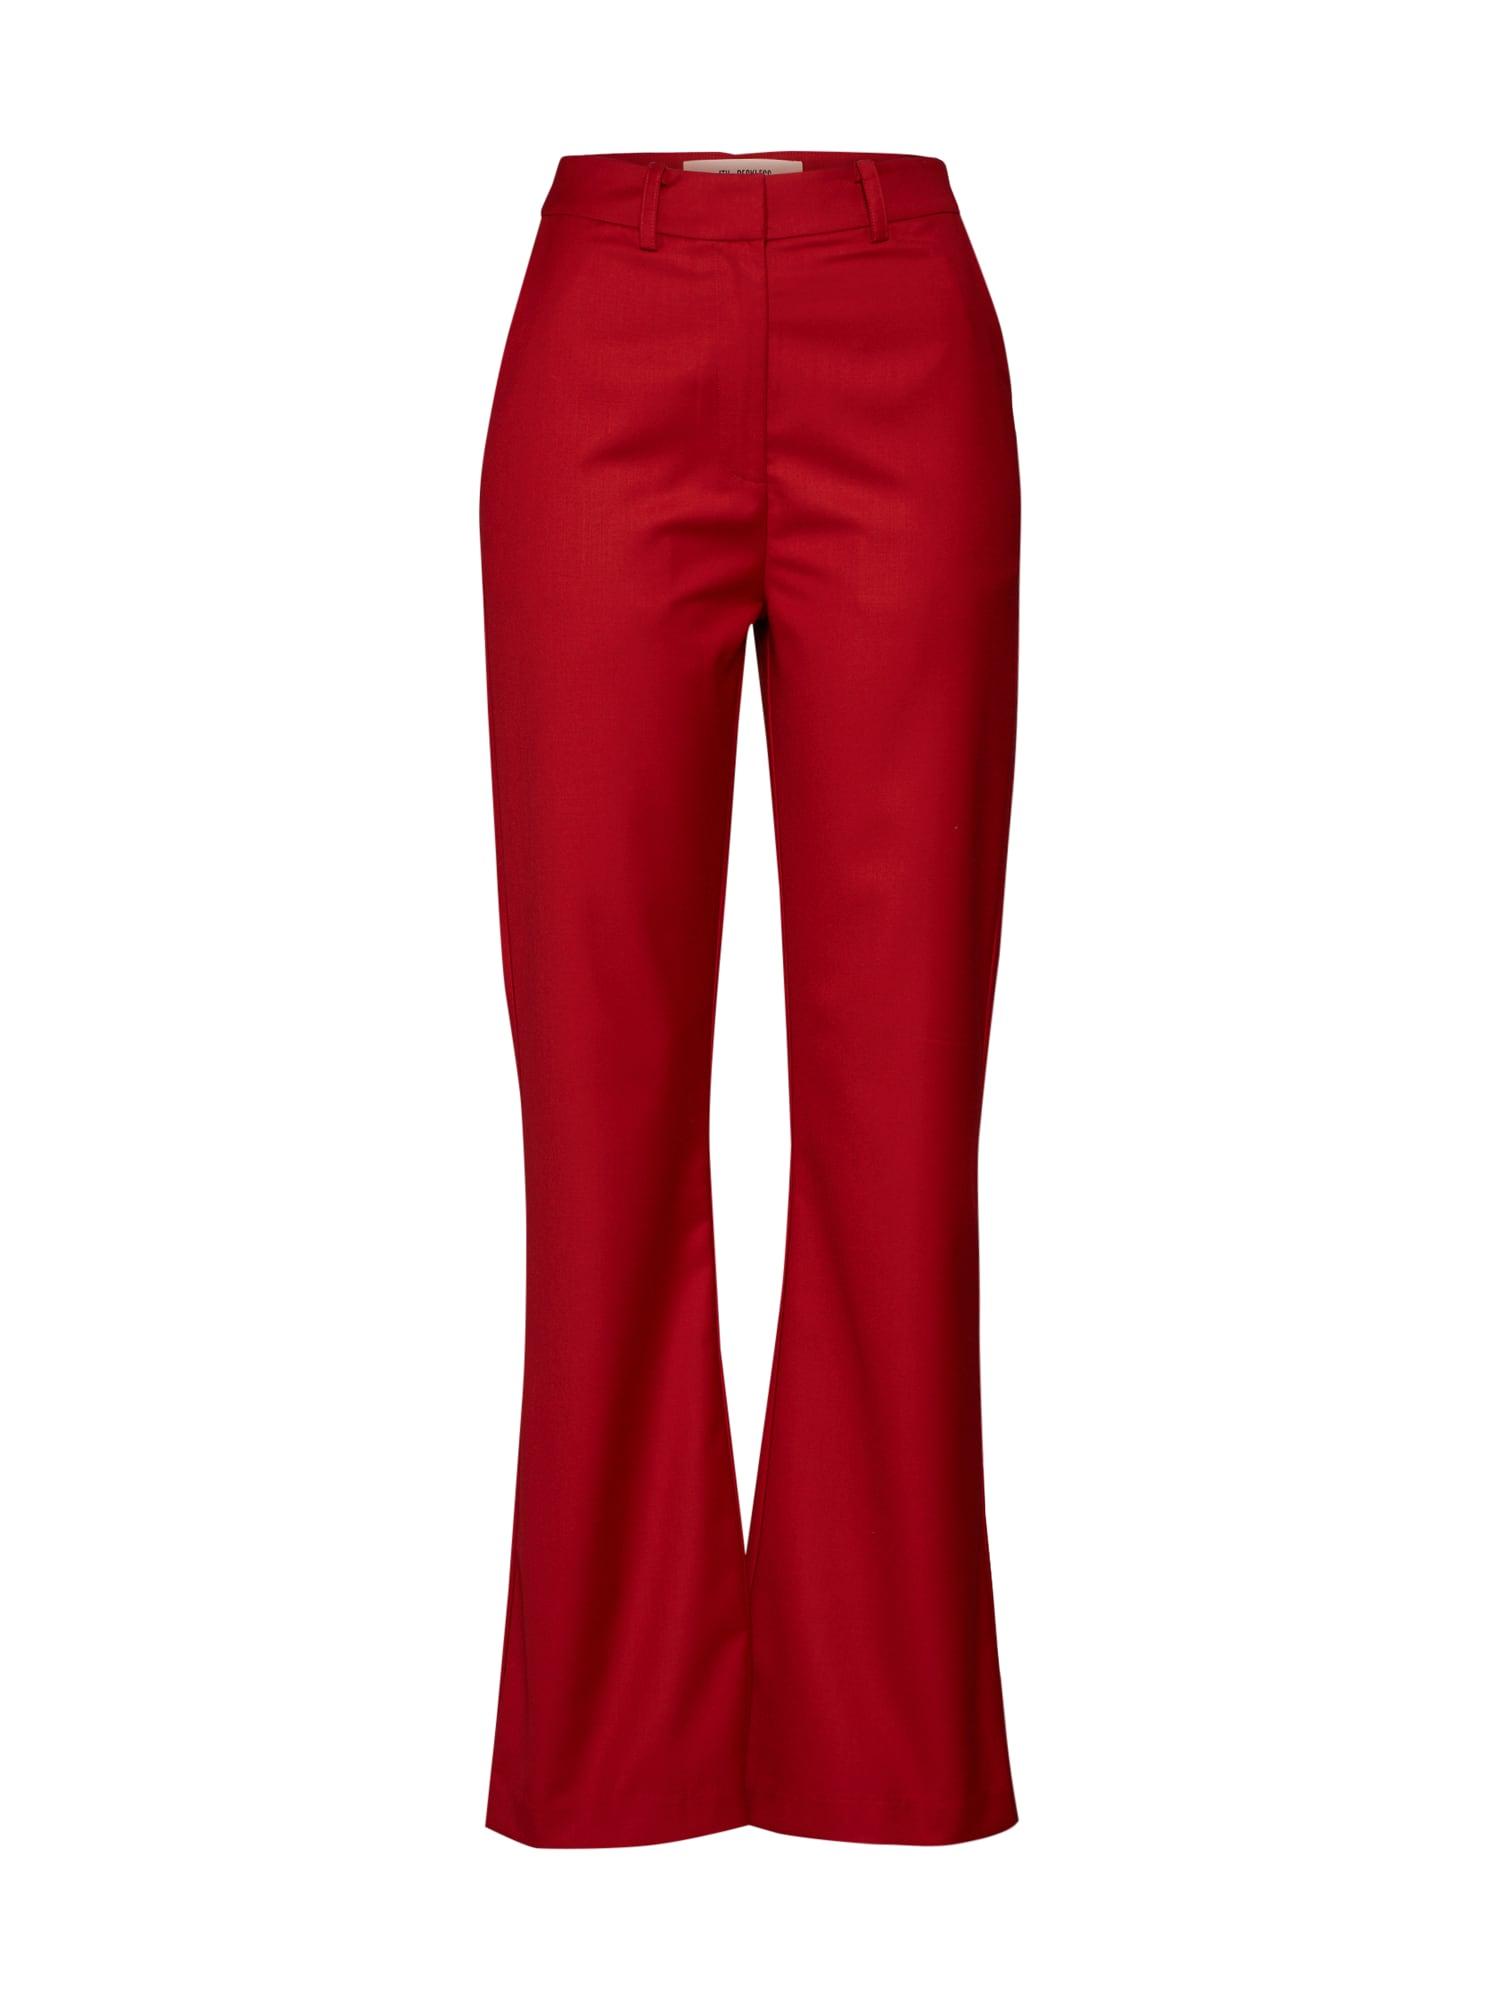 Kalhoty SHANGHAI TROUSER červená 4th & Reckless